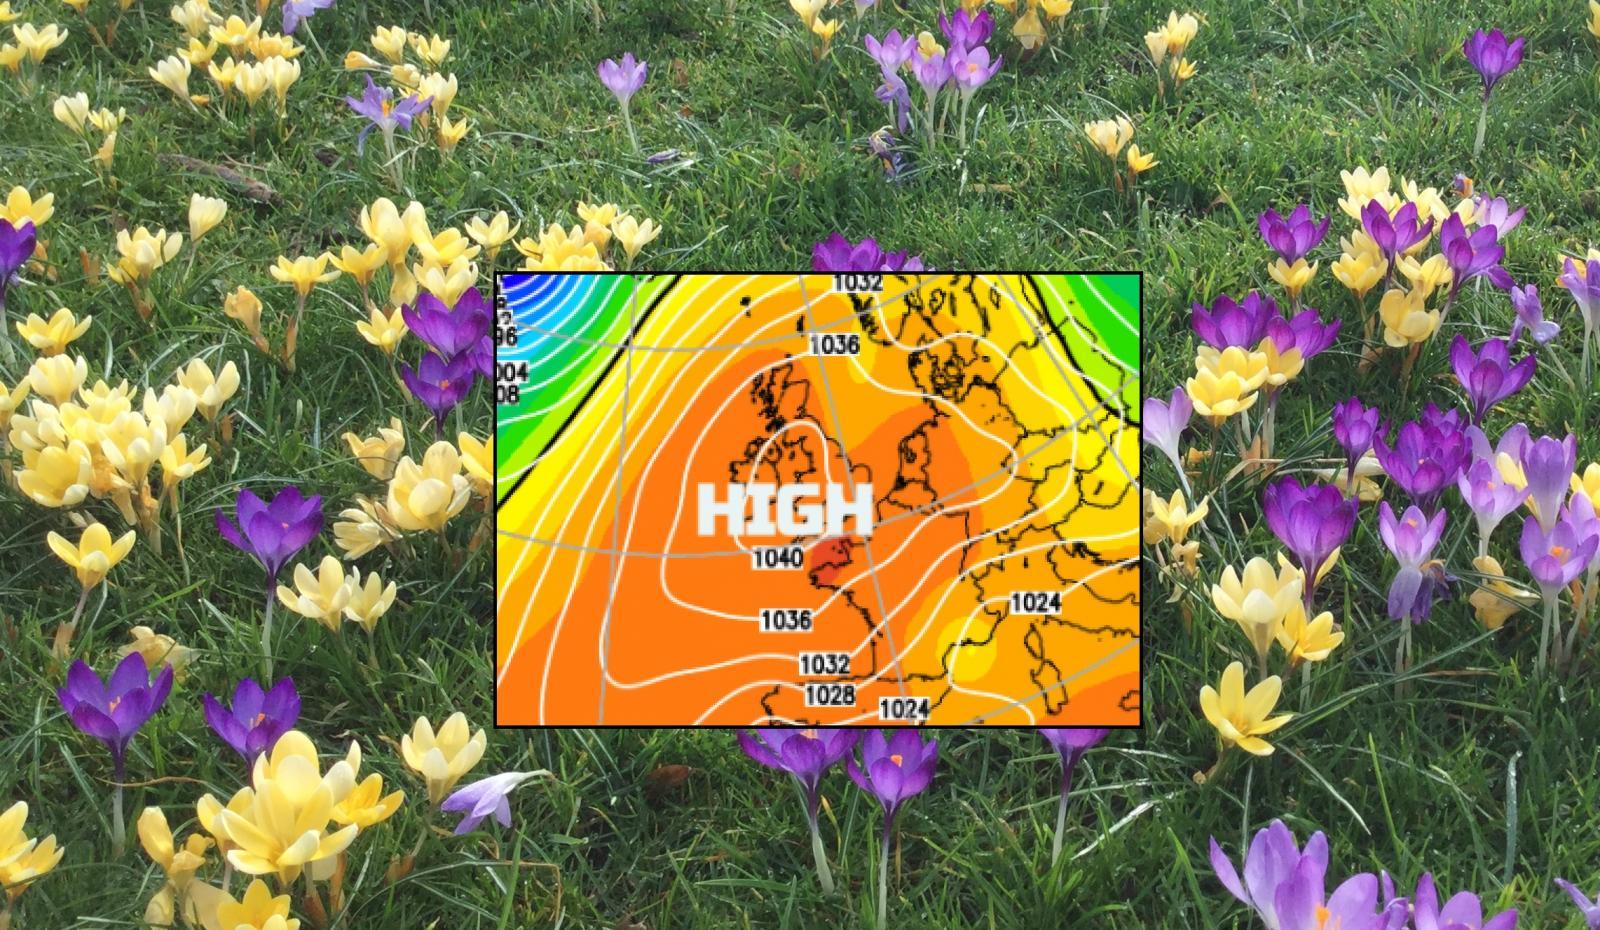 Weekend high pressure brings settled, fair weather to end February